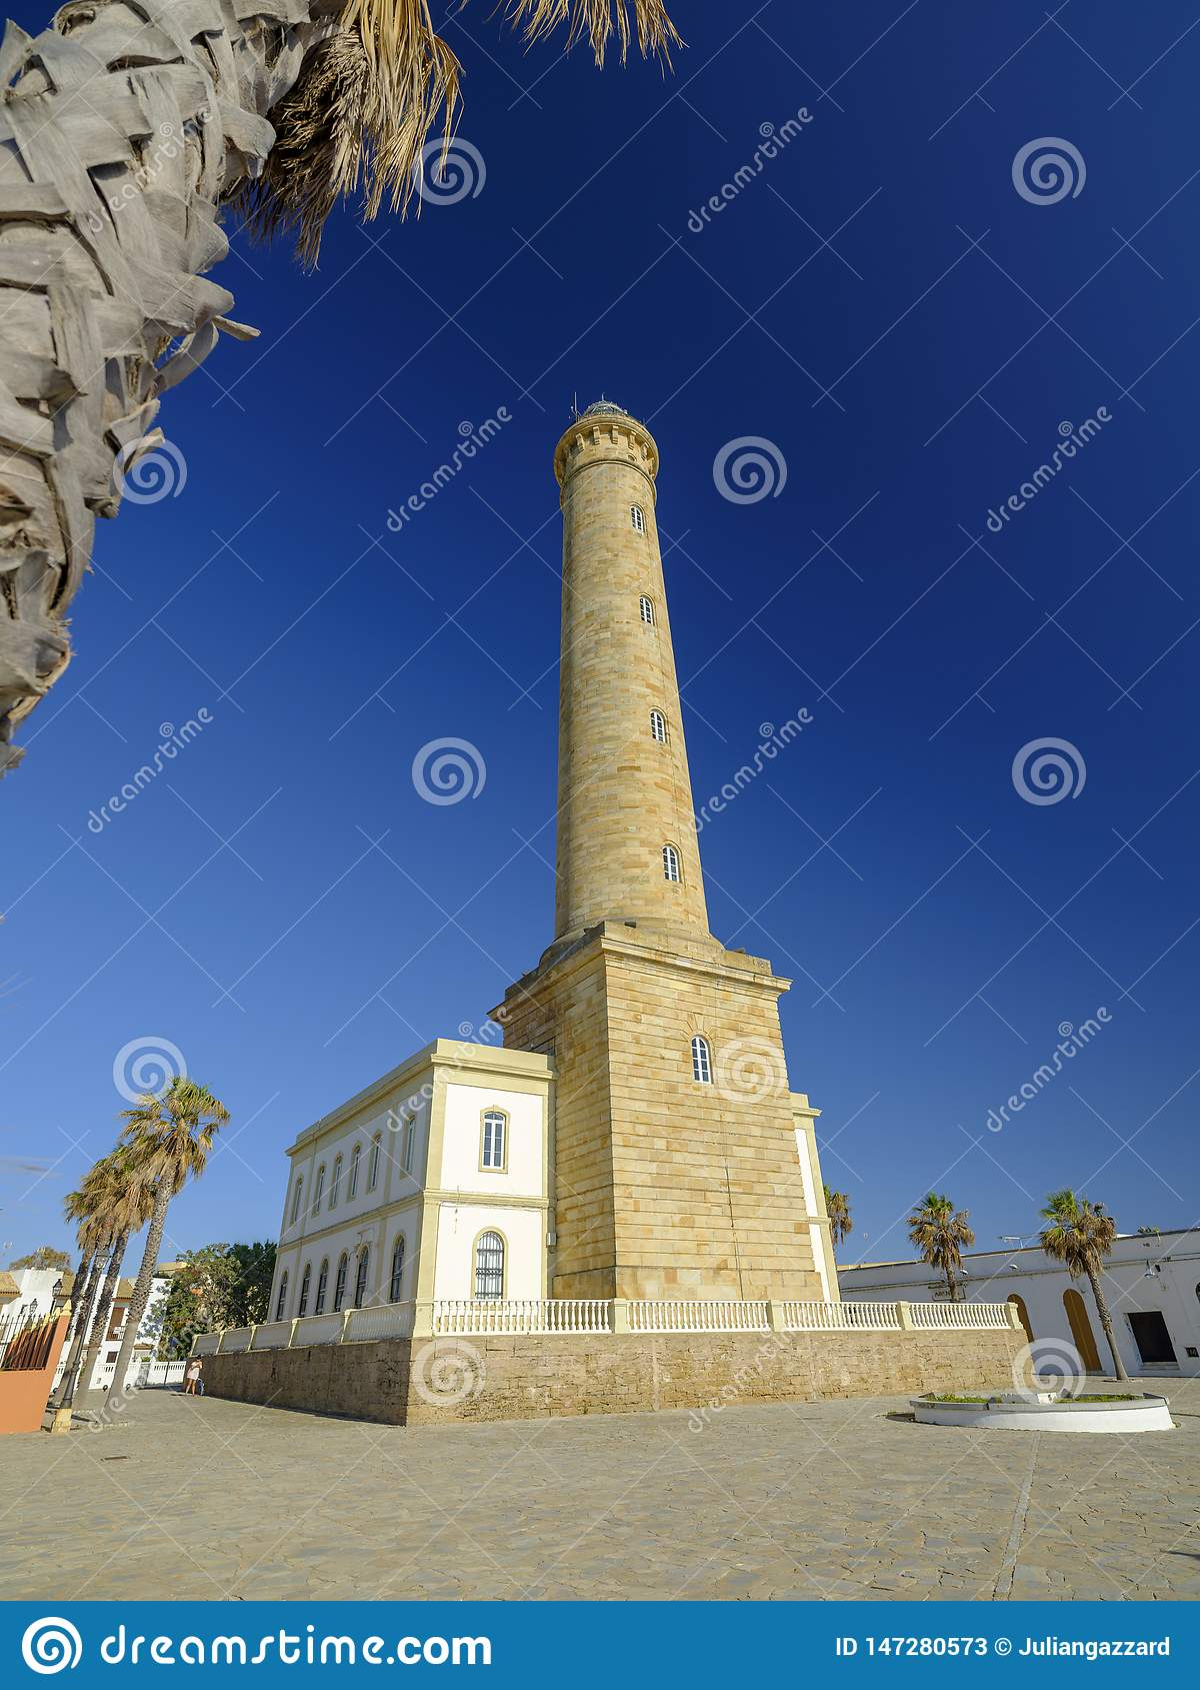 Faro de Chipiona, lightouse Chipiona, Καντίζ, Ανδαλουσία, Ισπανία